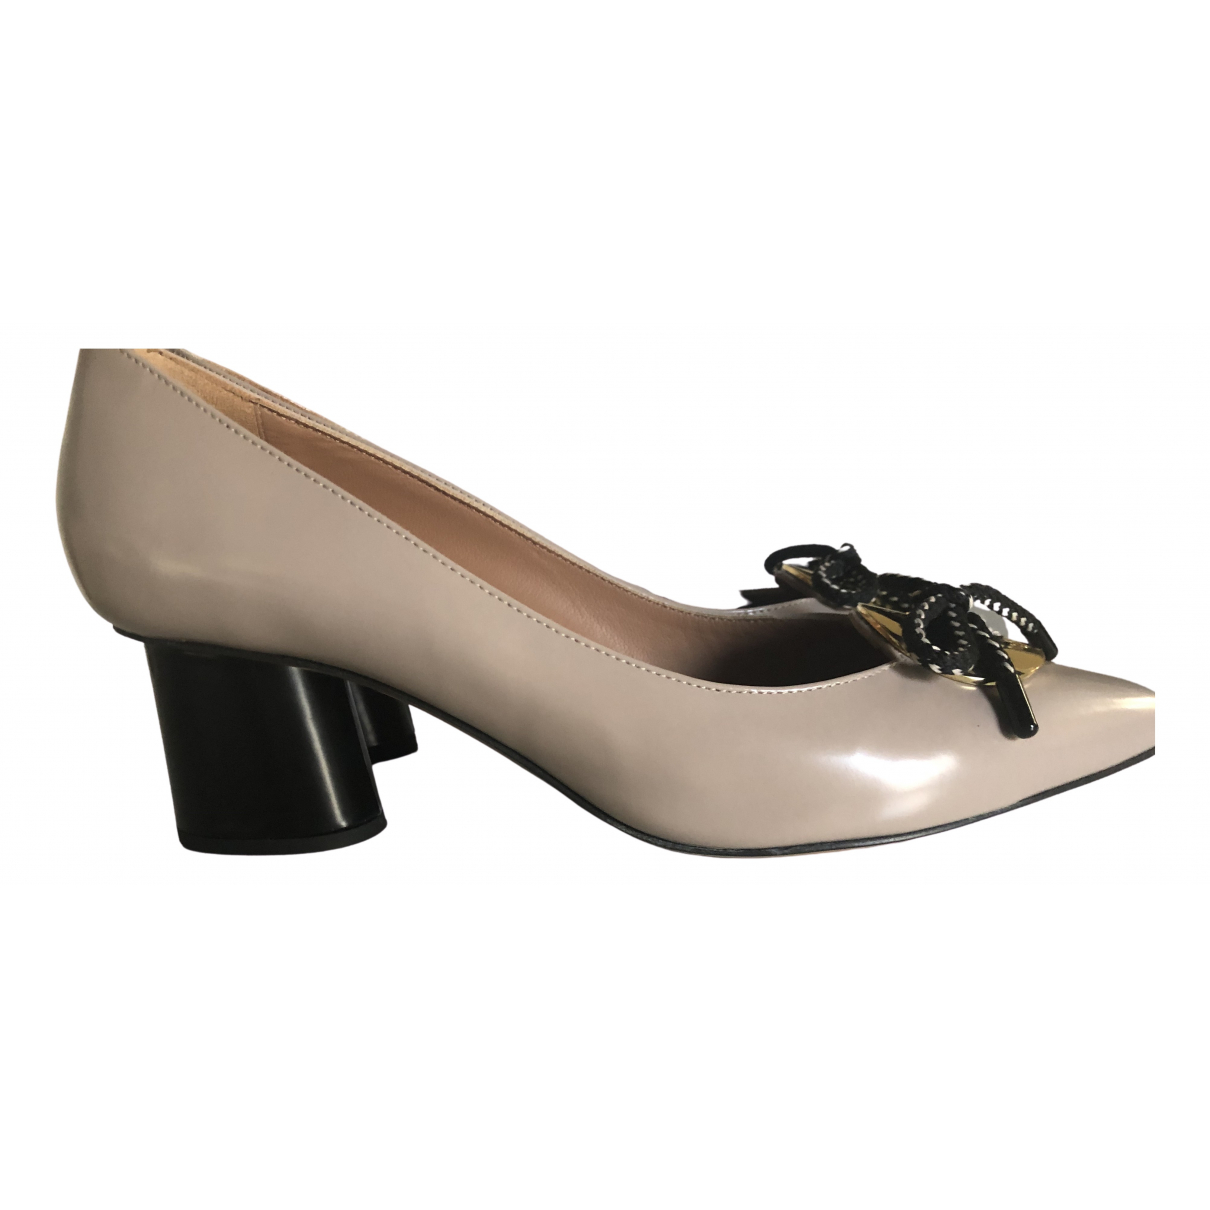 Emporio Armani - Escarpins   pour femme en cuir - beige